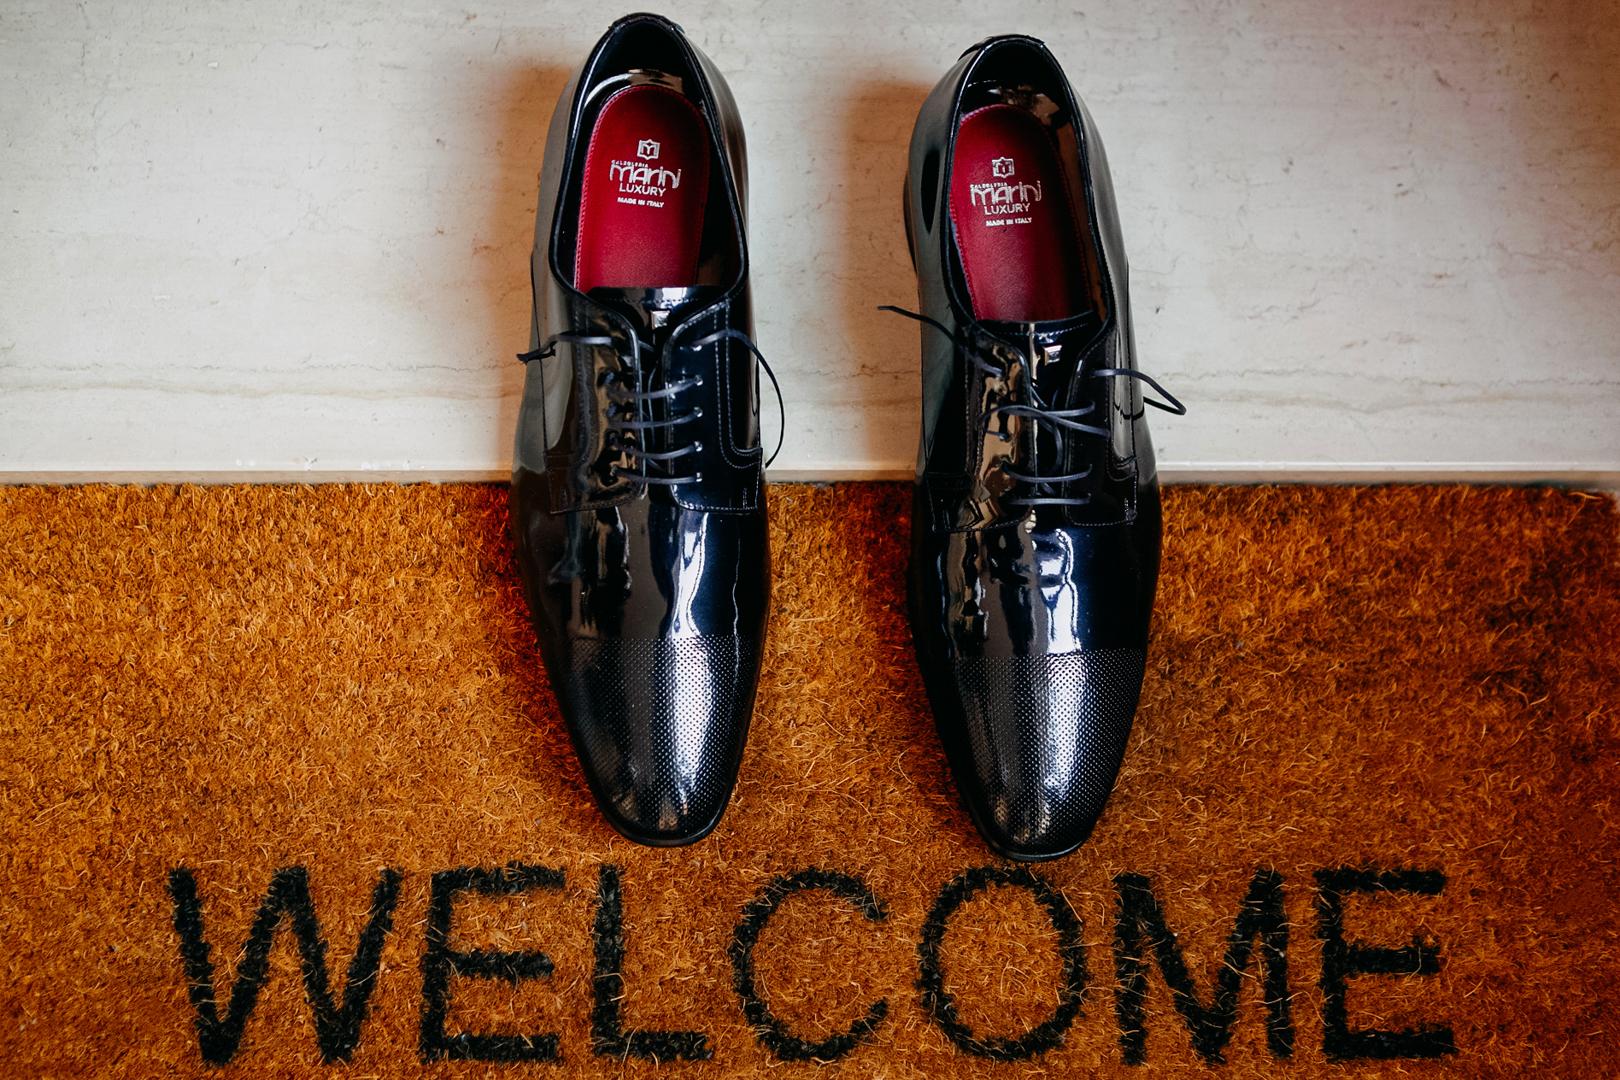 2 gianni-lepore-scarpe-sposo